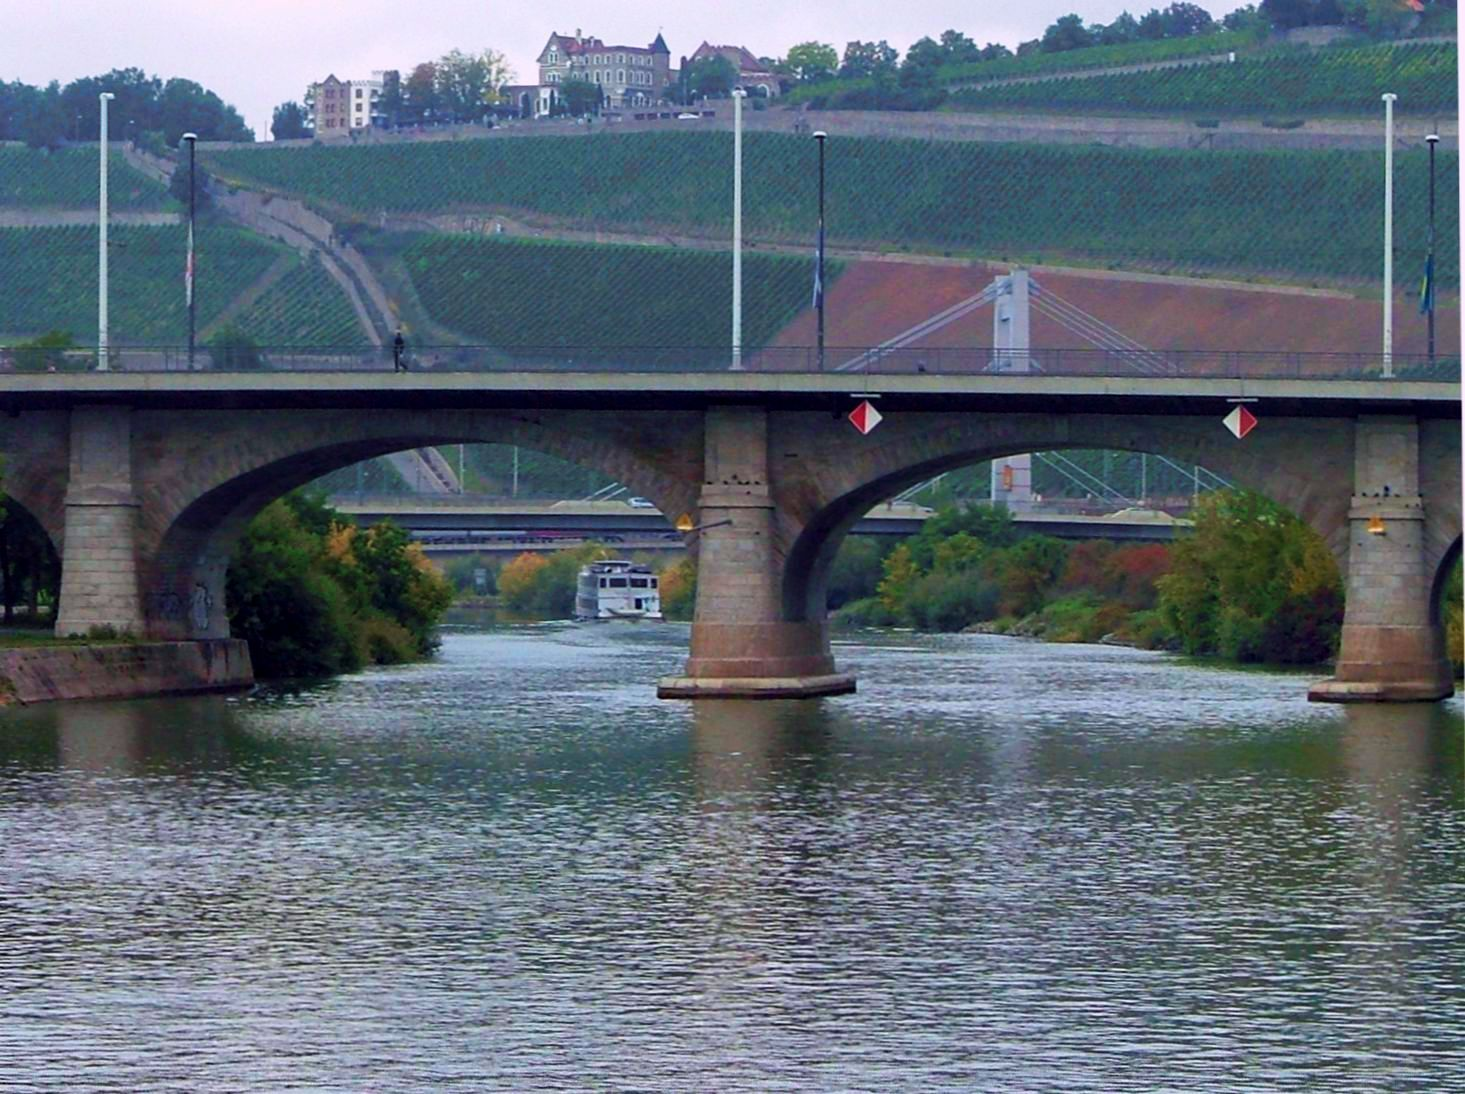 A newer arch bridge at Wurzburg